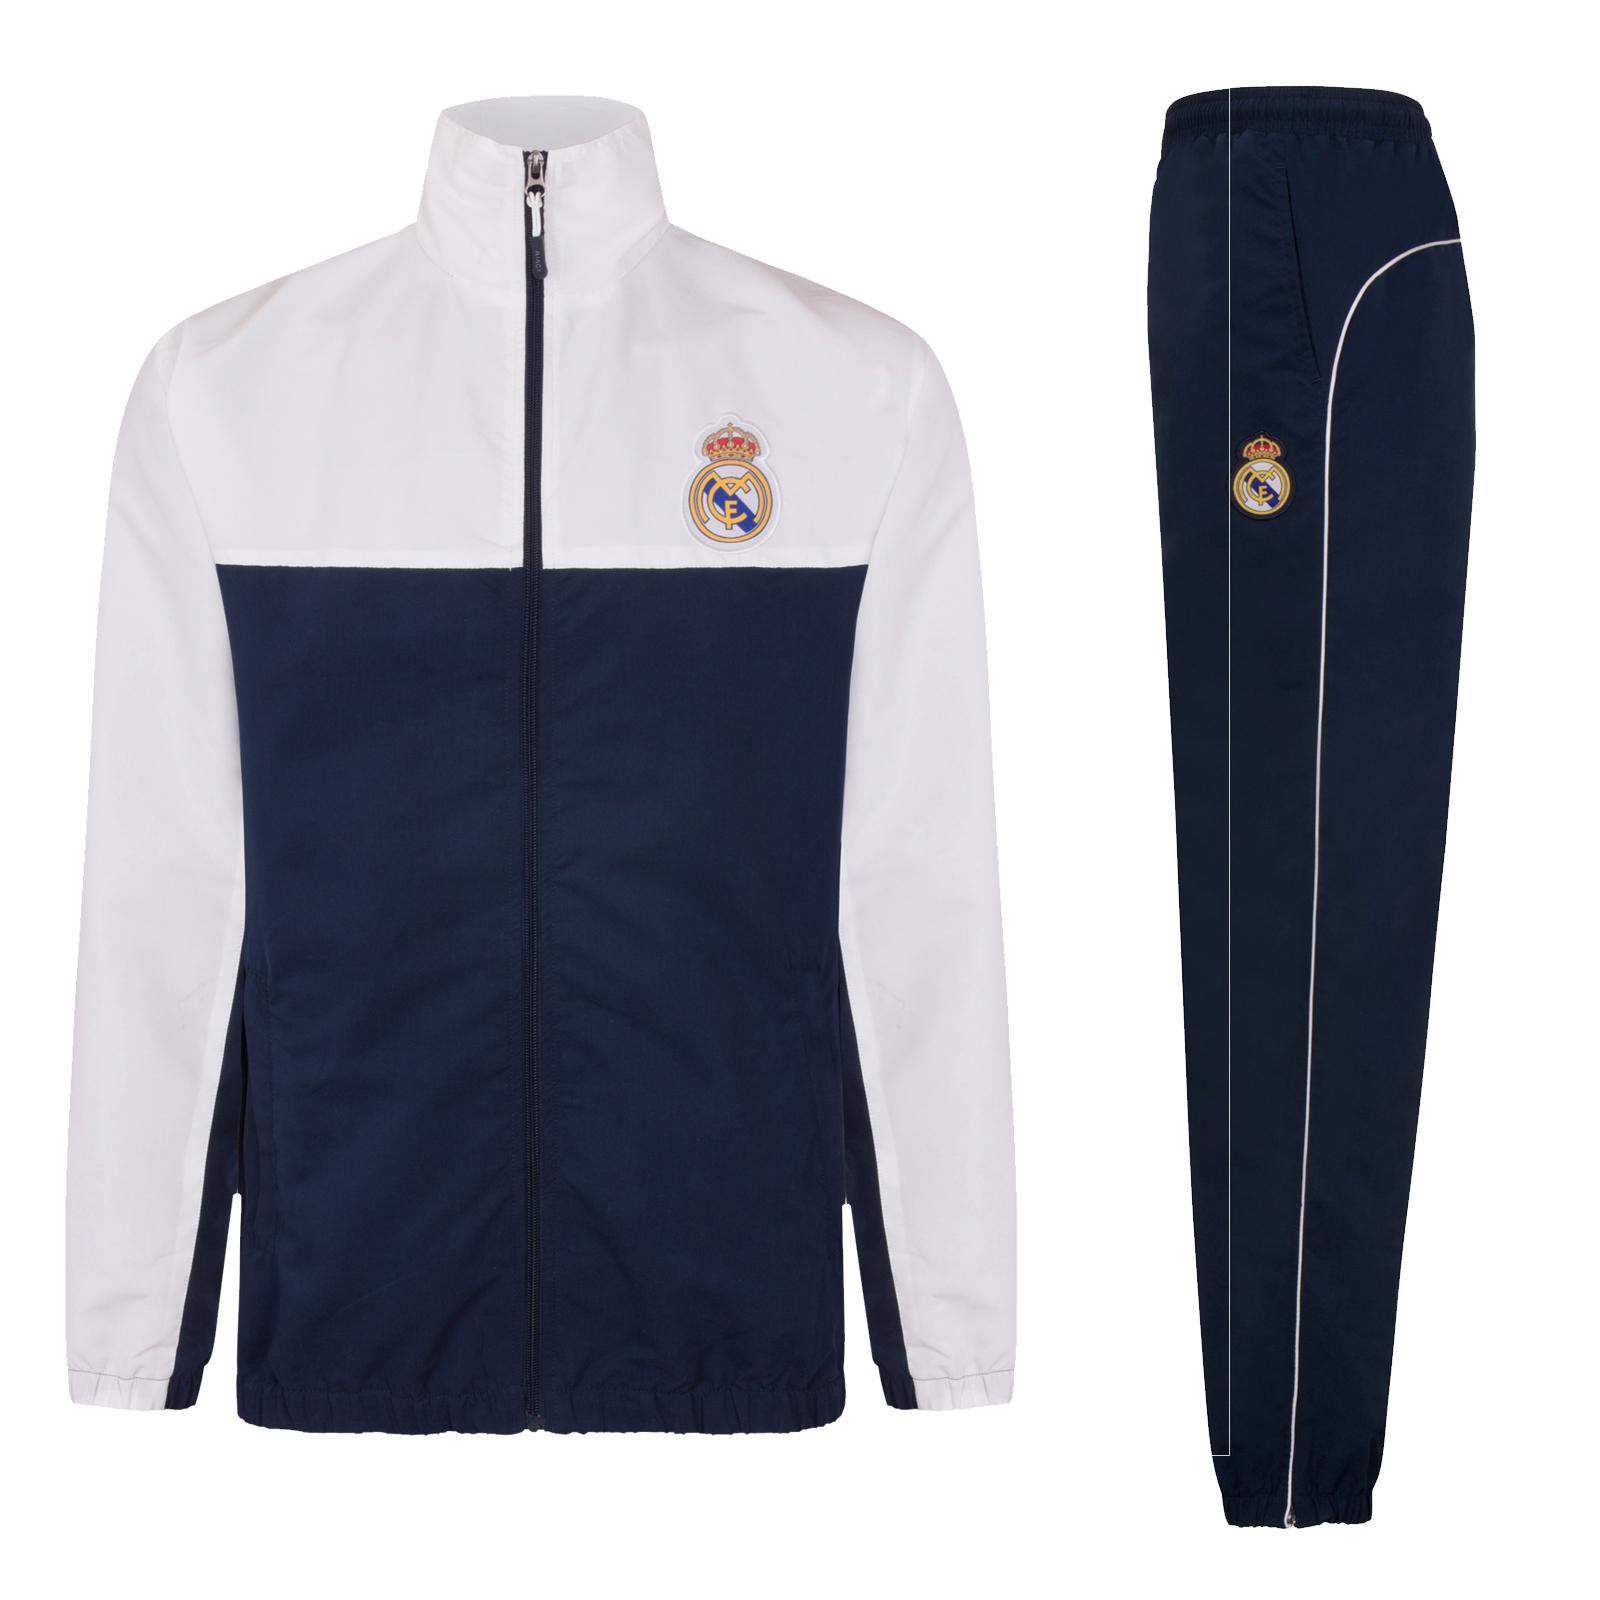 Details zu Real Madrid Herren Trainingsanzug Jacke & Hose Offizielles Merchandise